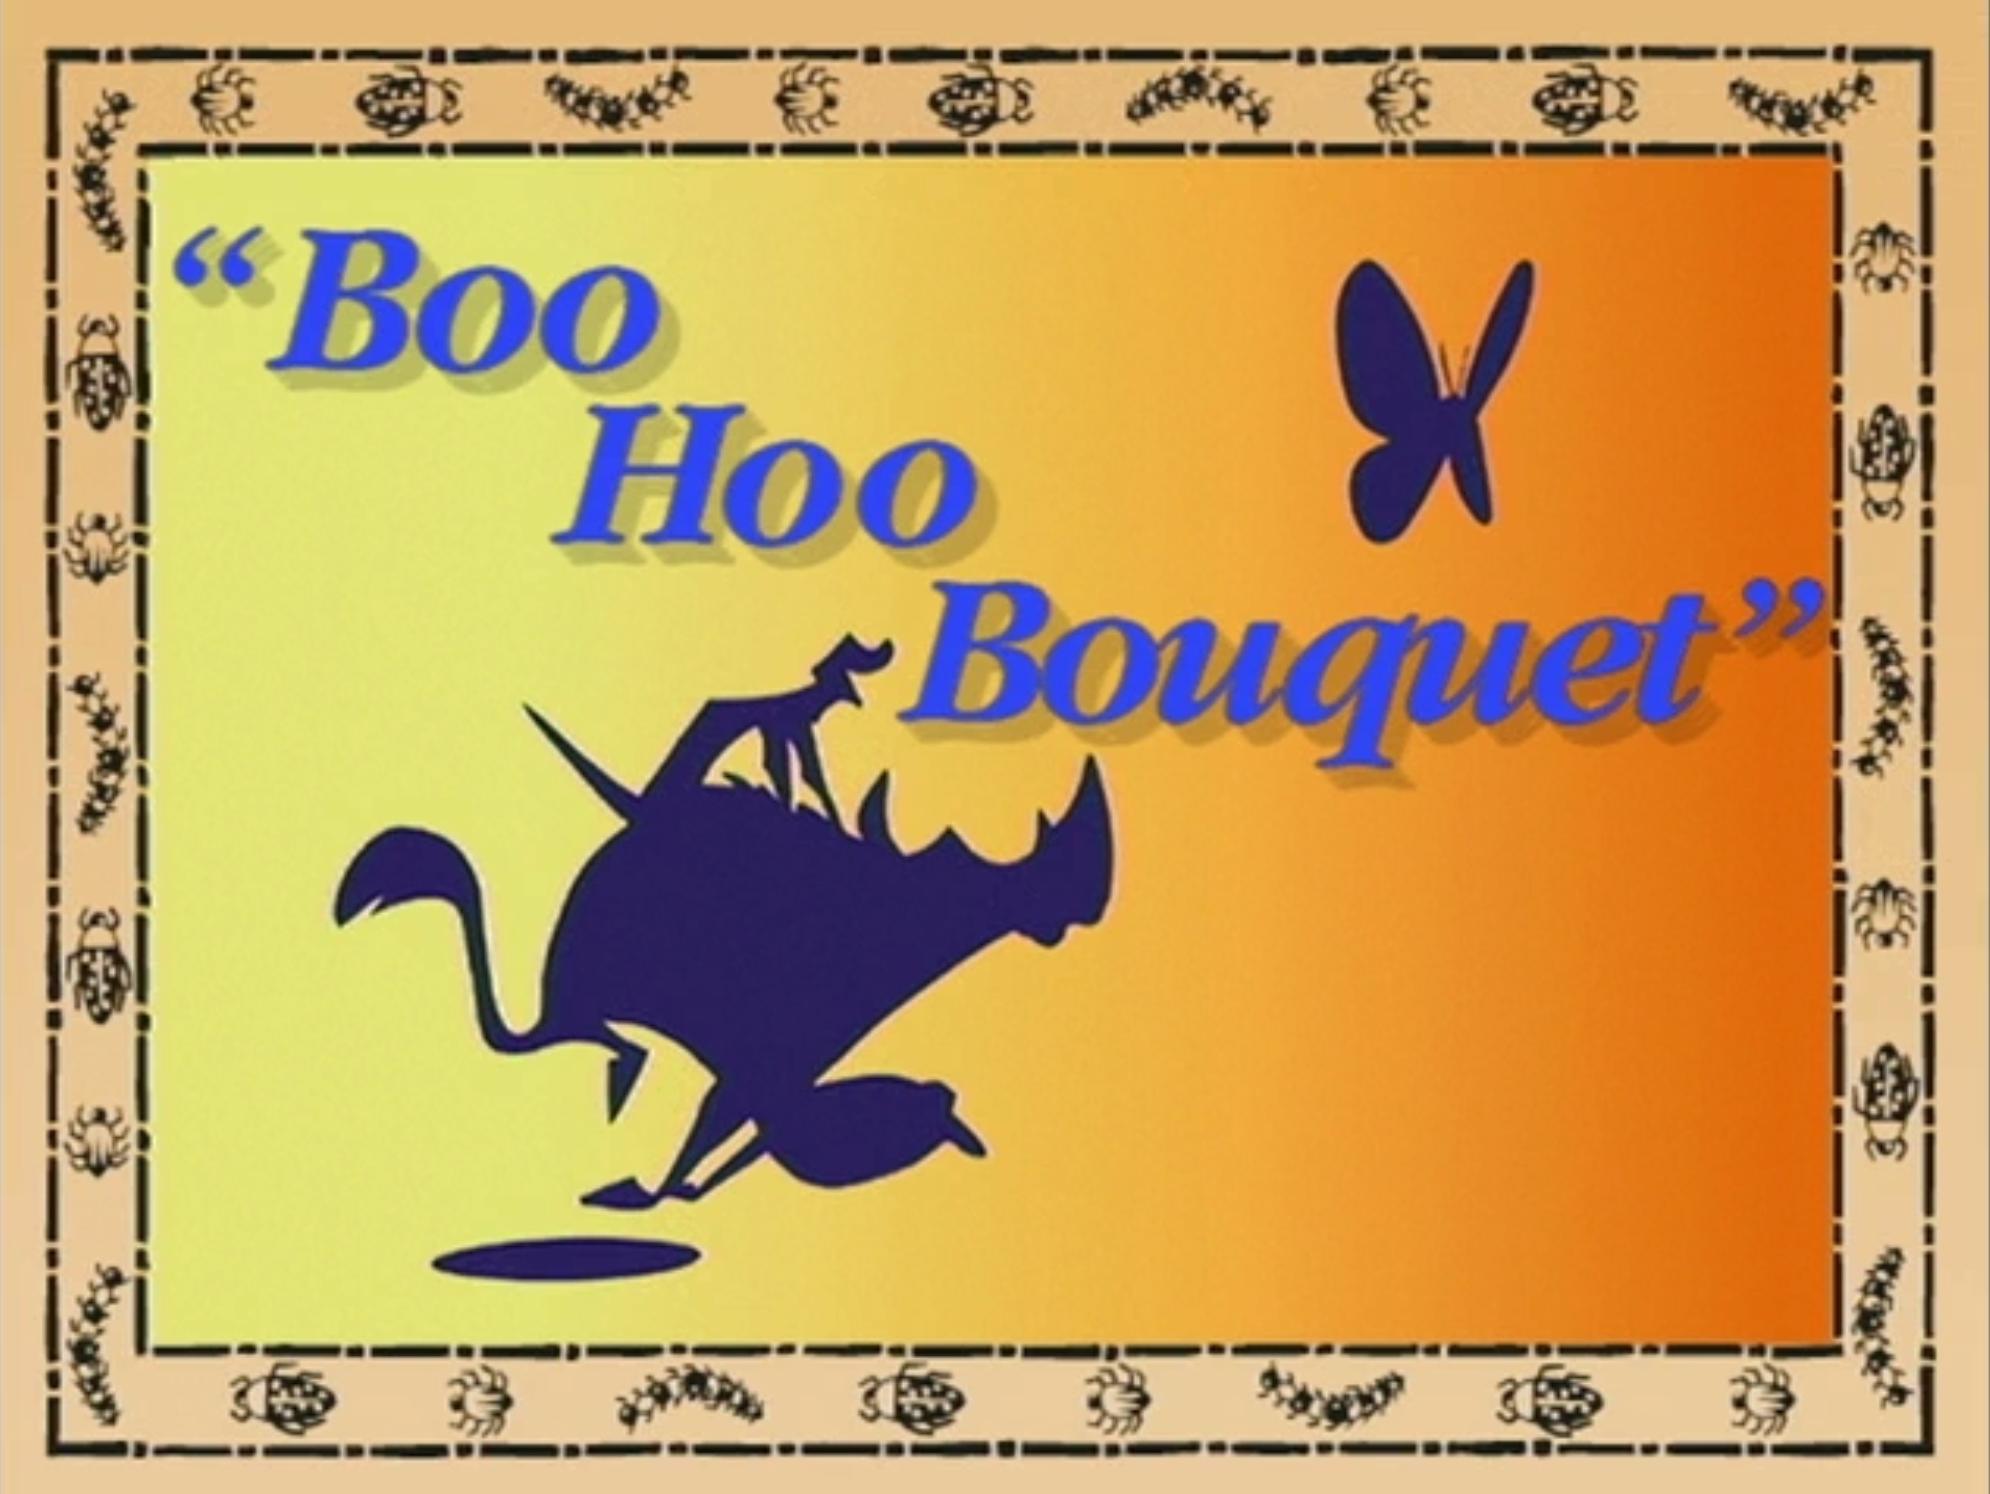 Boo Hoo Bouquet